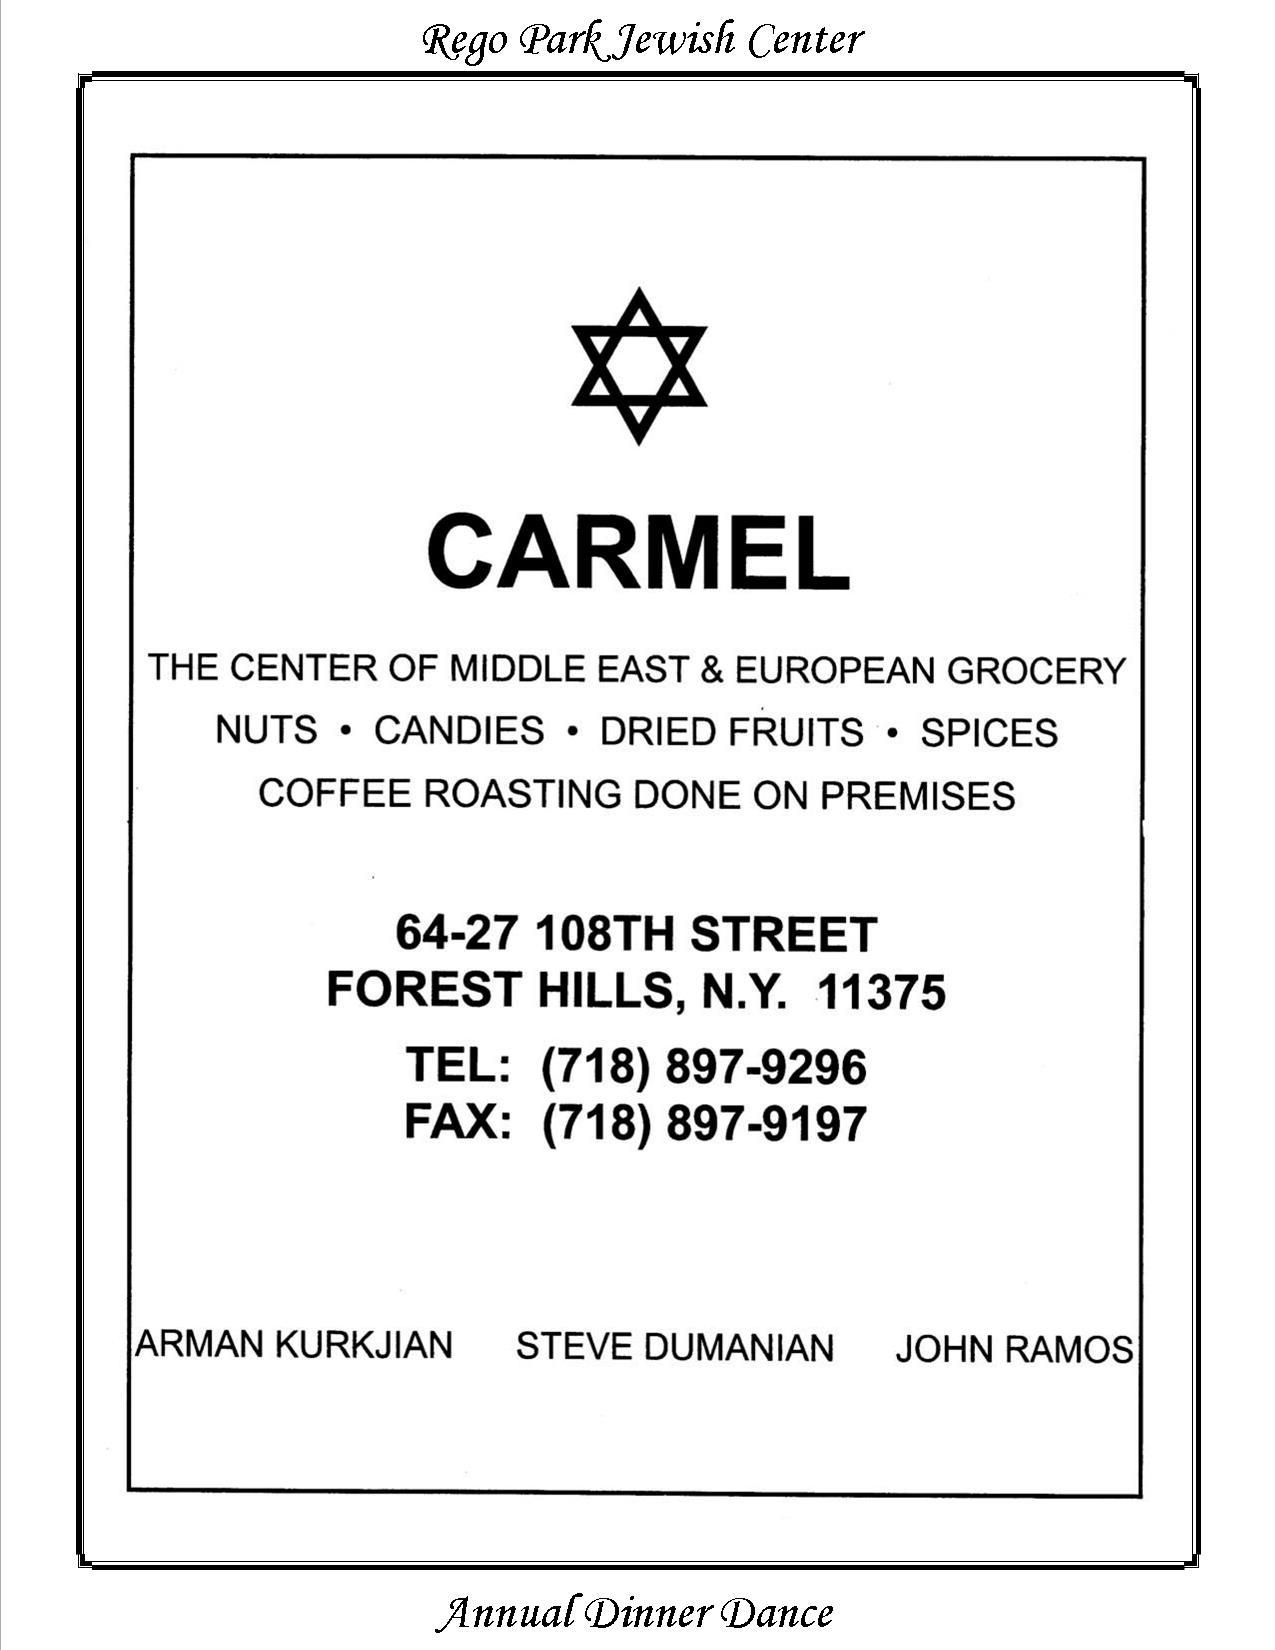 Bus. Carmel page 79 - Copy.jpg